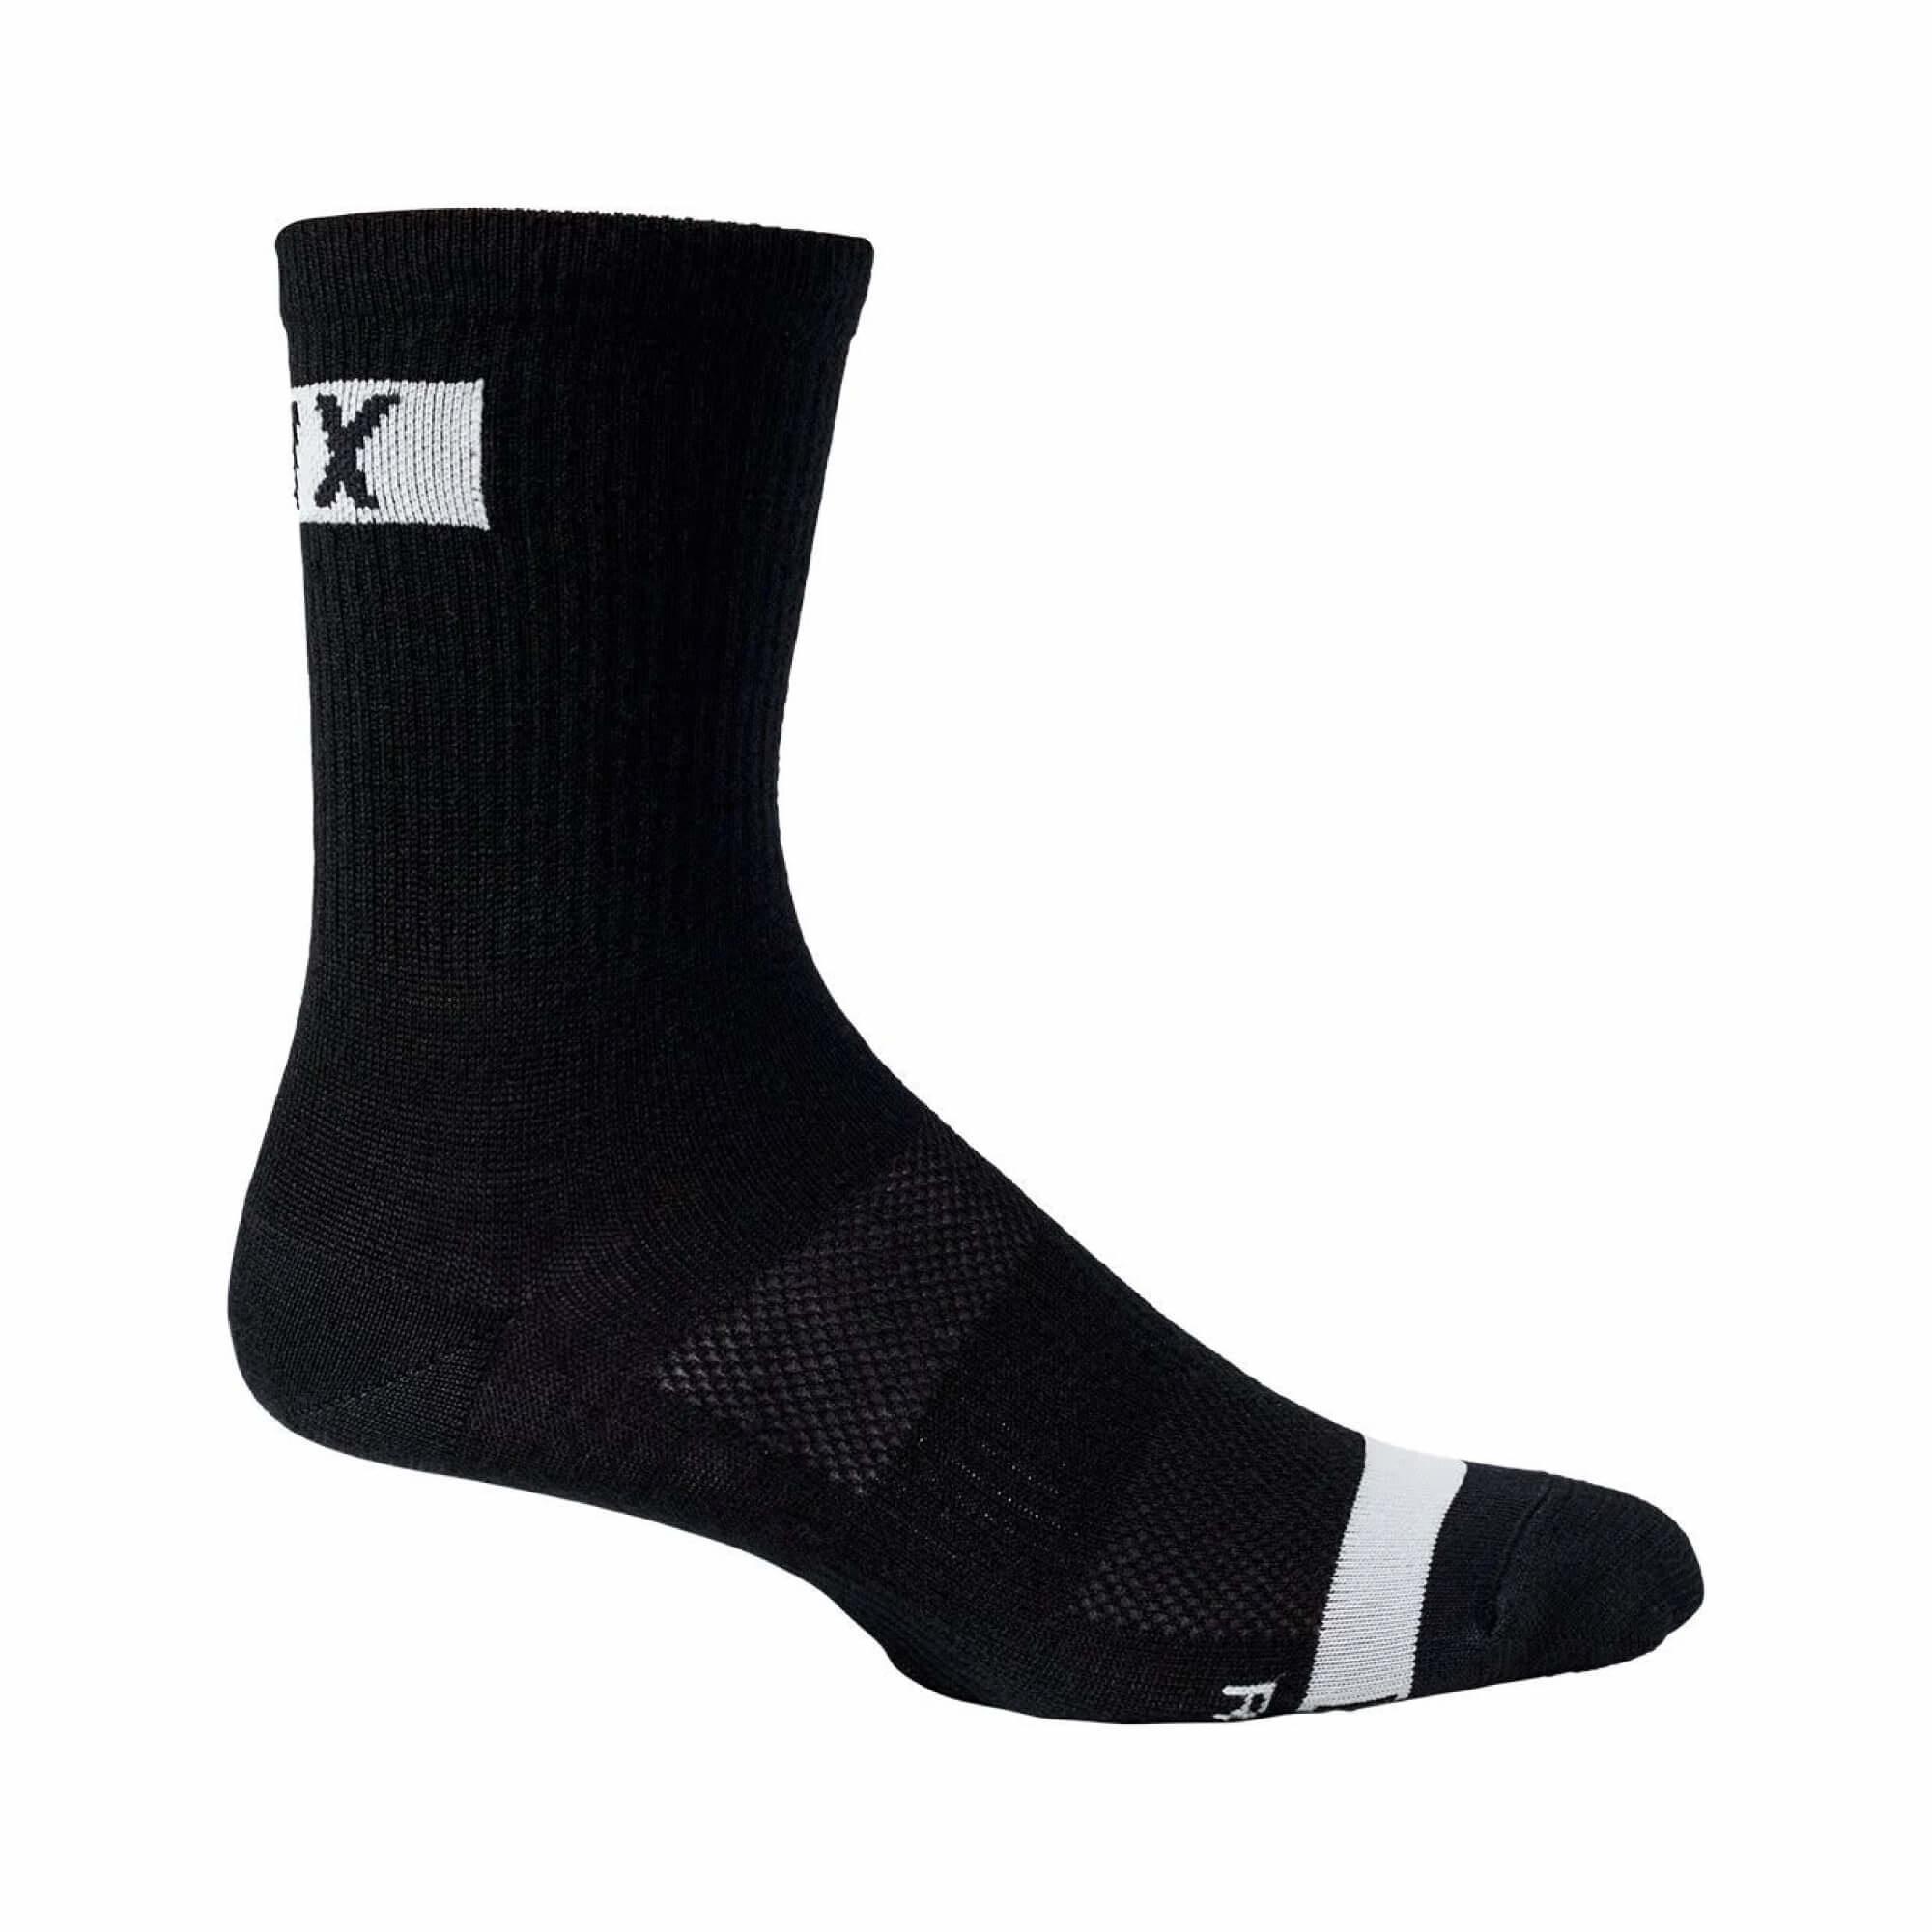 "6"" Flexair Merino Sock 2021-1"